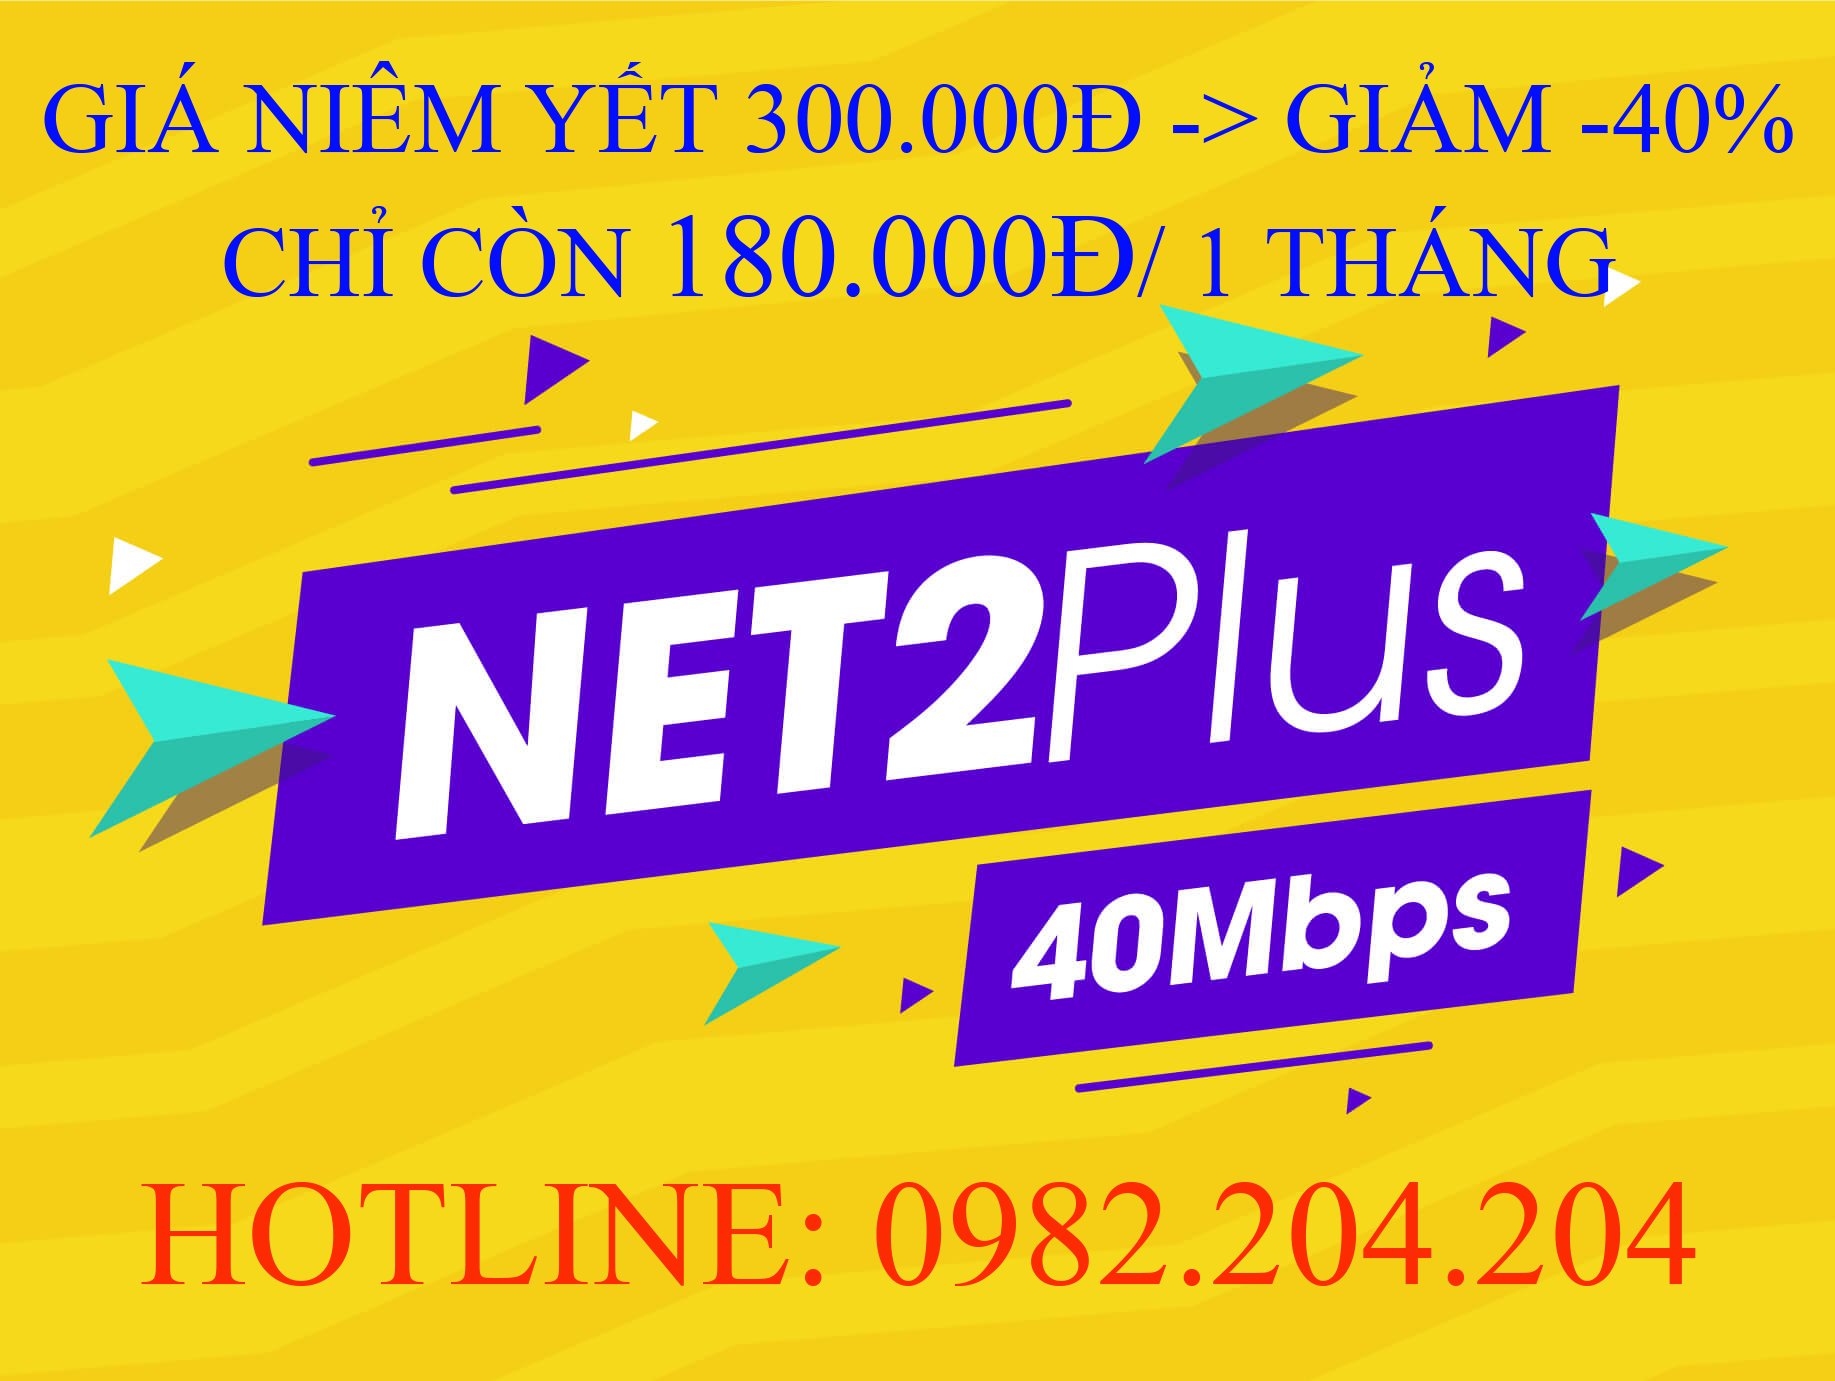 Lắp mạng Viettel gói Net 2 Plus